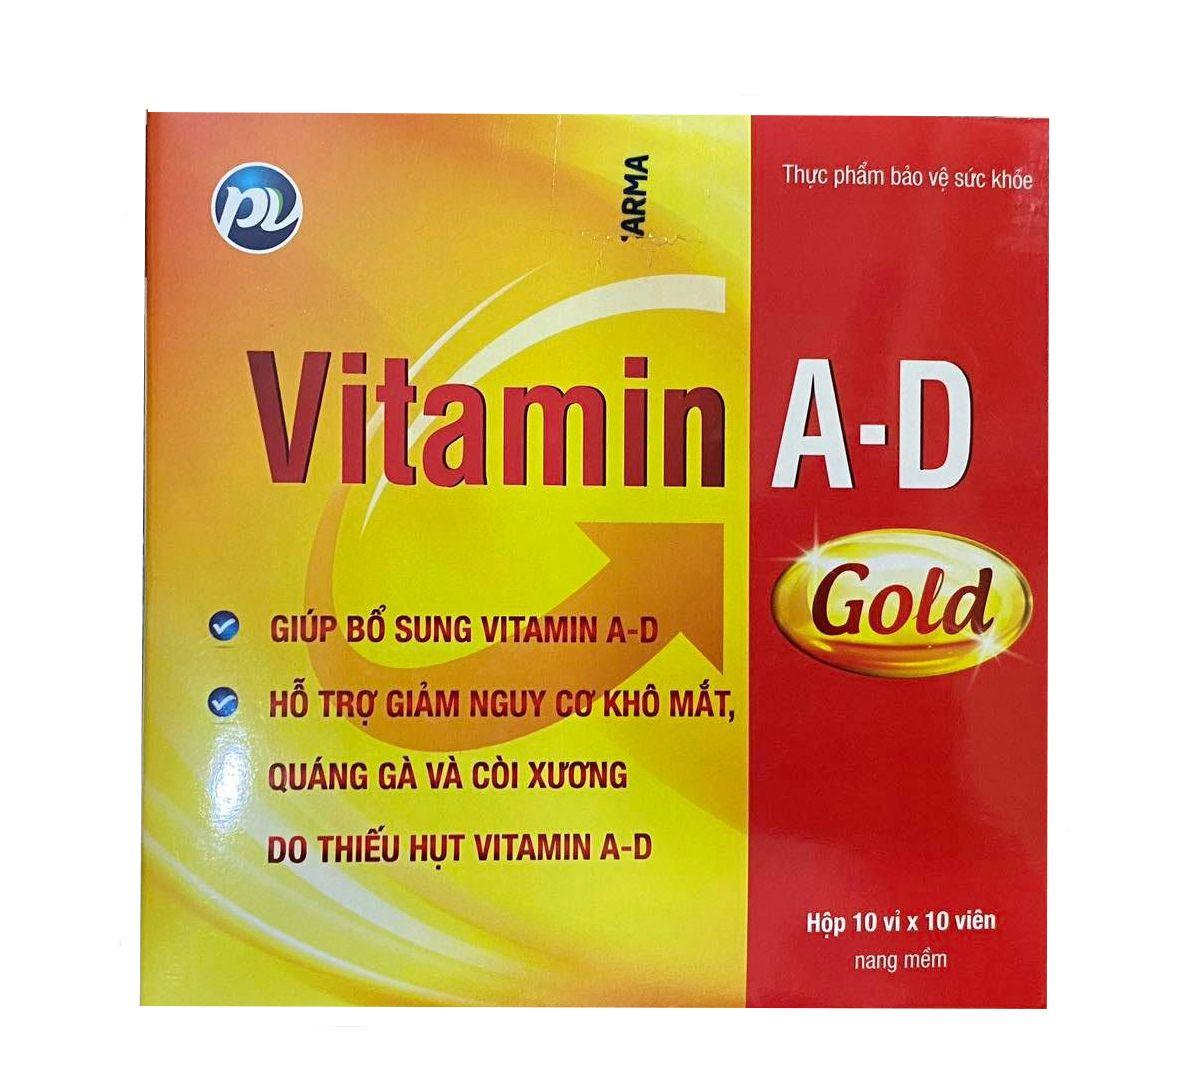 Bổ sung vitamin A, D giúp phòng ngừa thiếu vitamin A, D cho trẻ em, phụ nữ